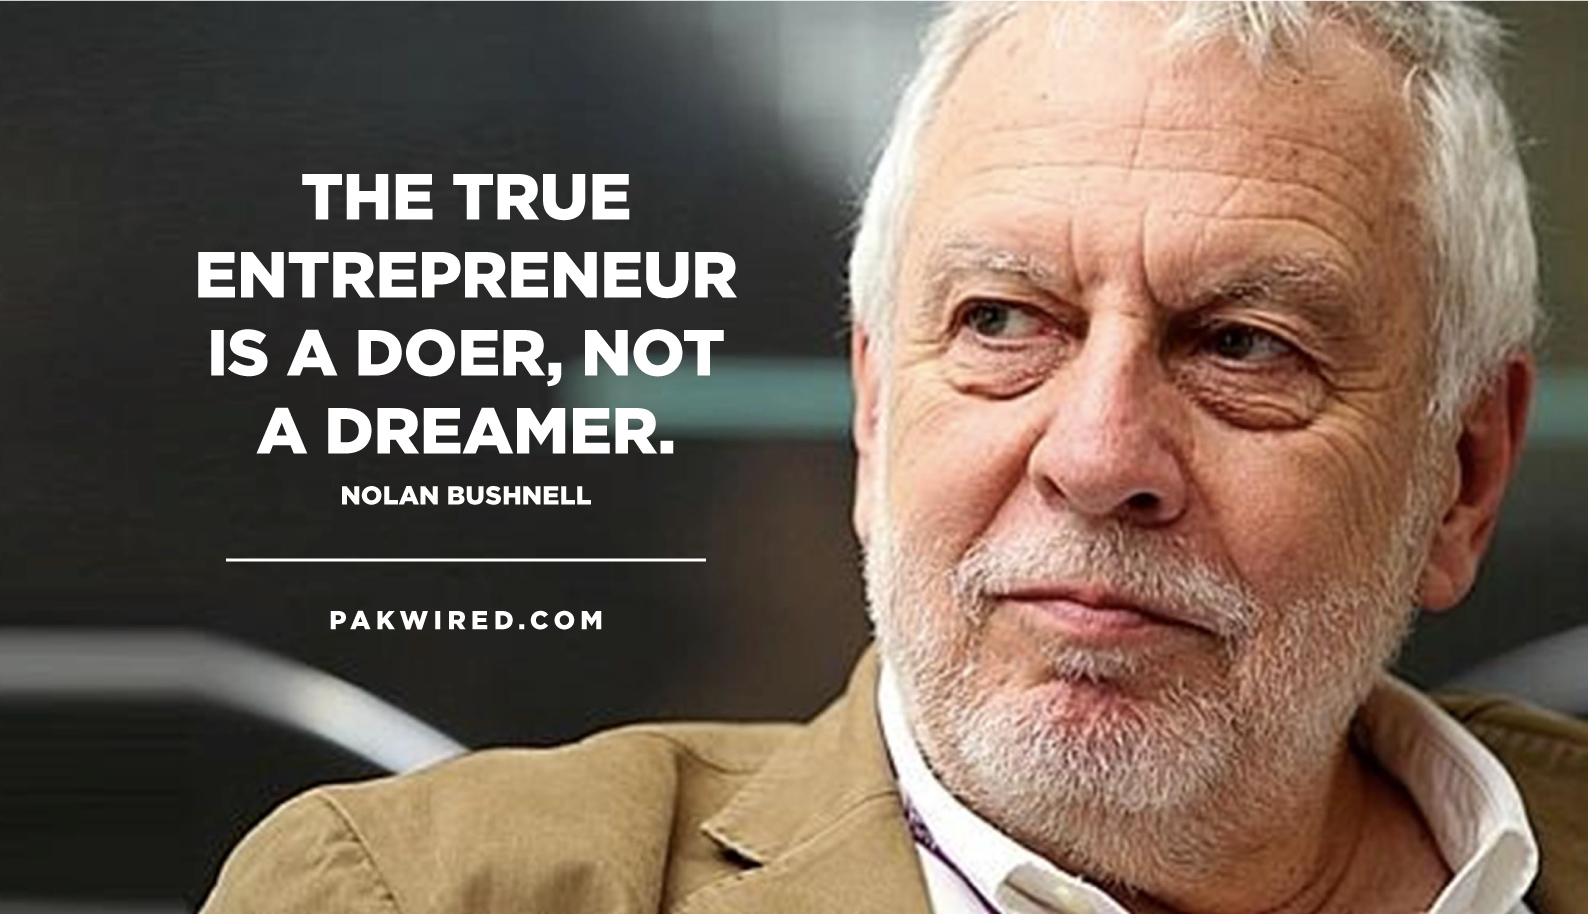 The true entrepreneur is a doer, not a dreamer.